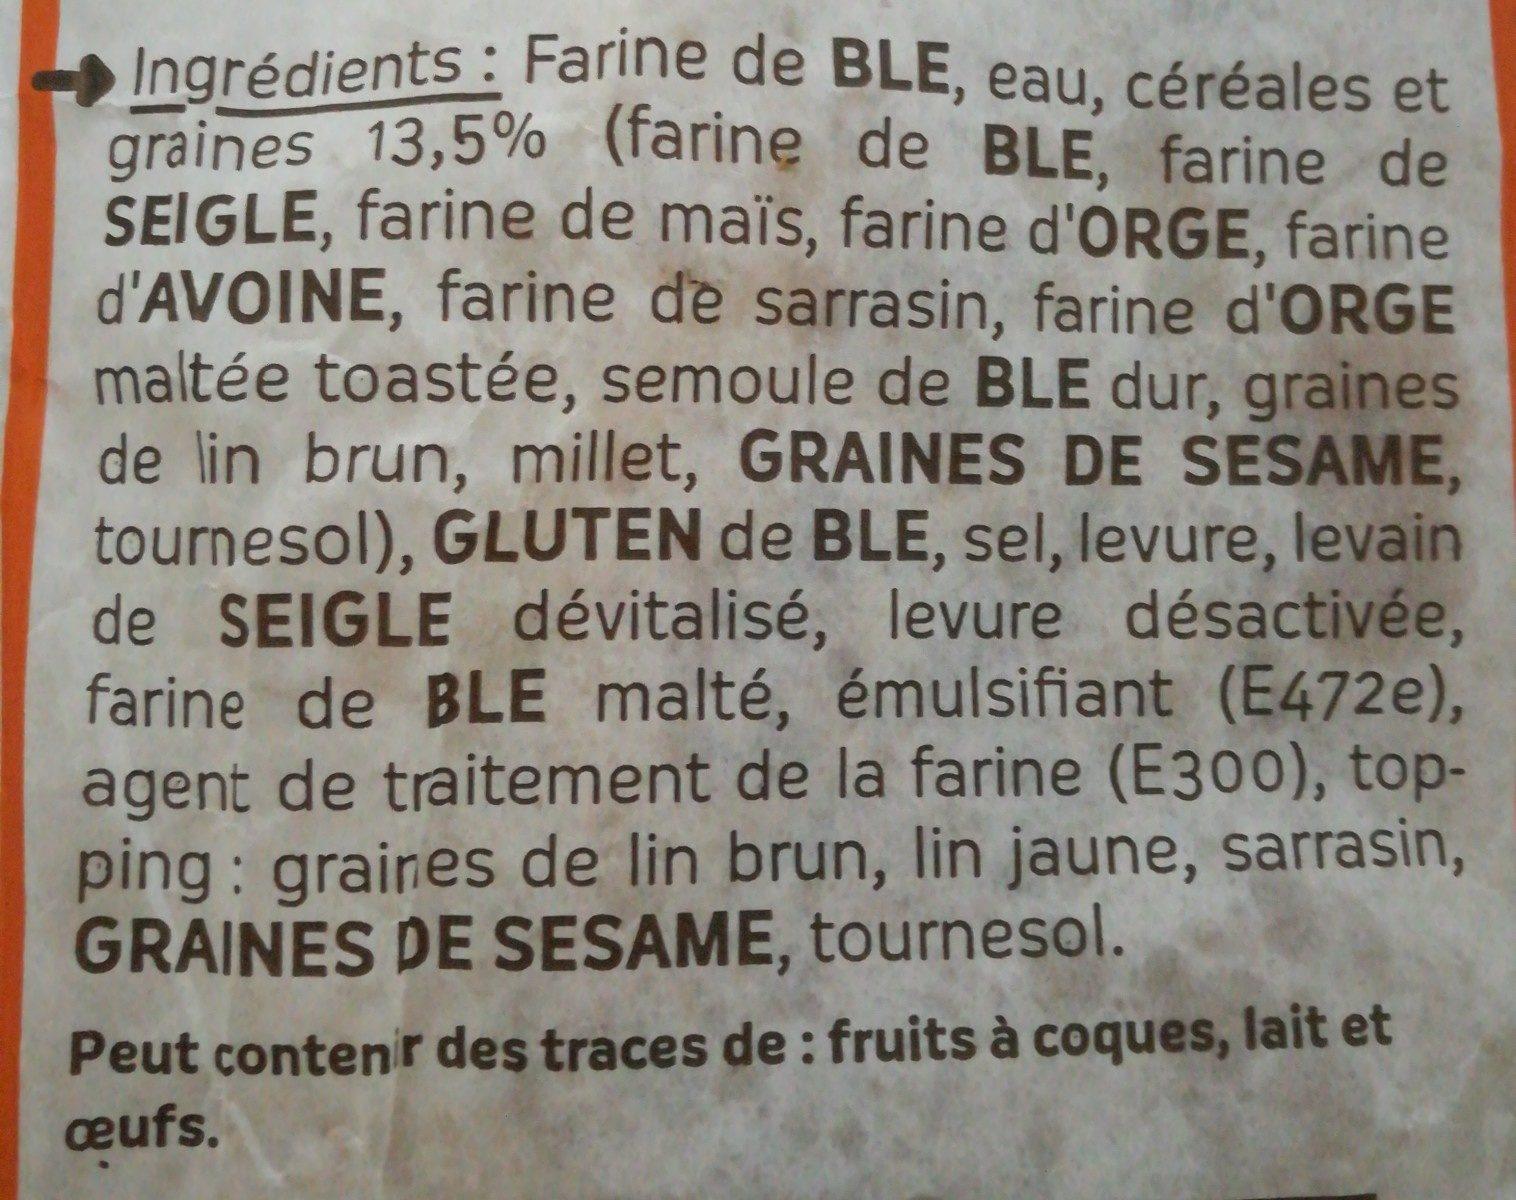 Batard céréales - Ingrédients - fr